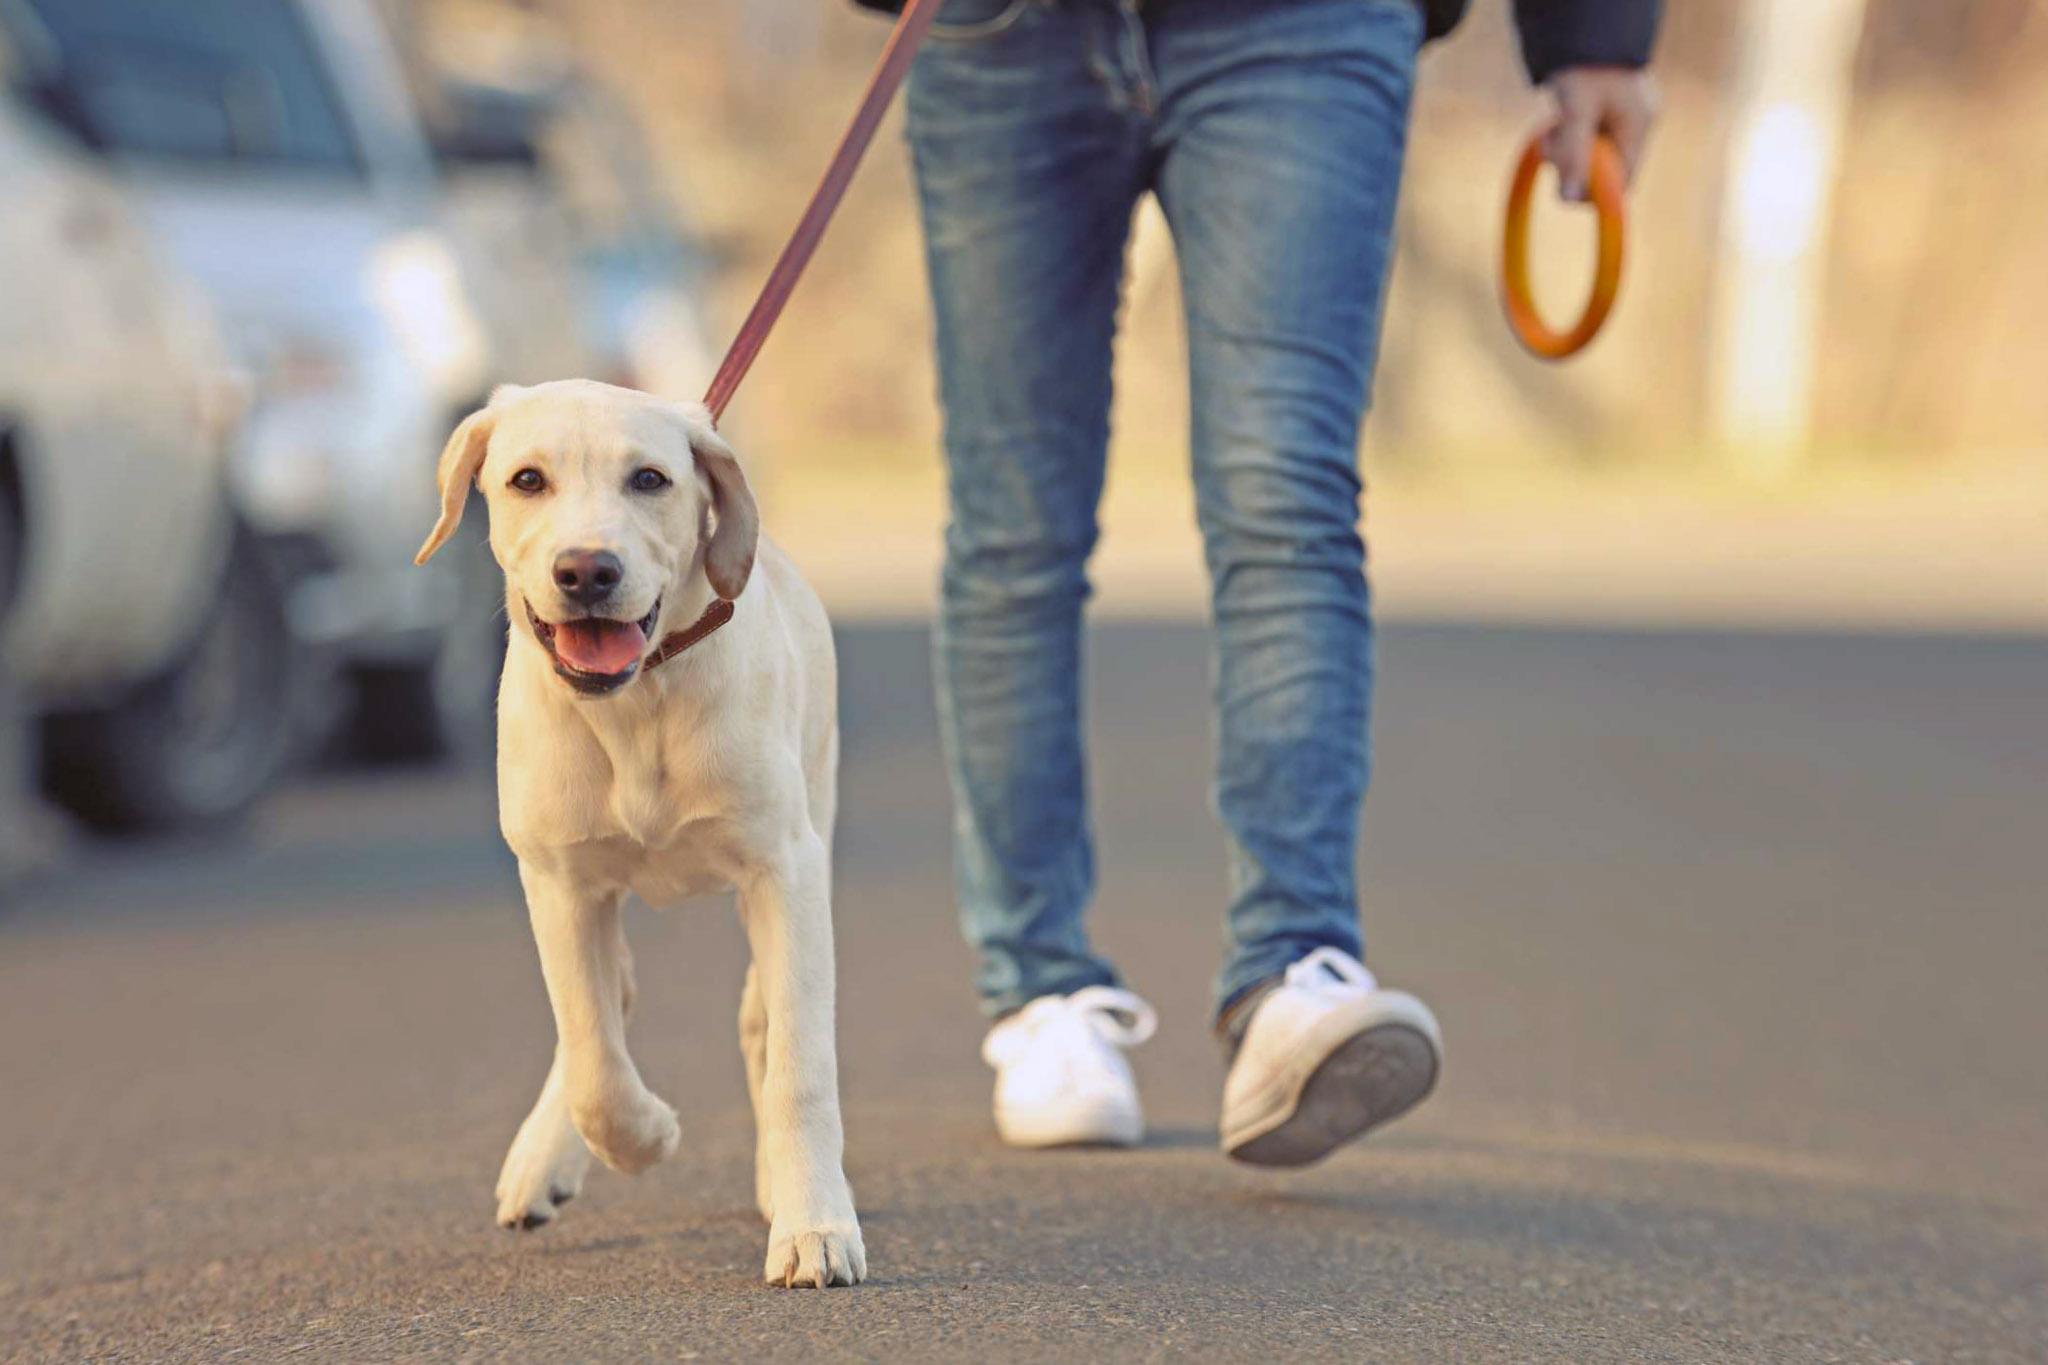 К чему может привести выгул собаки без намордника и поводка